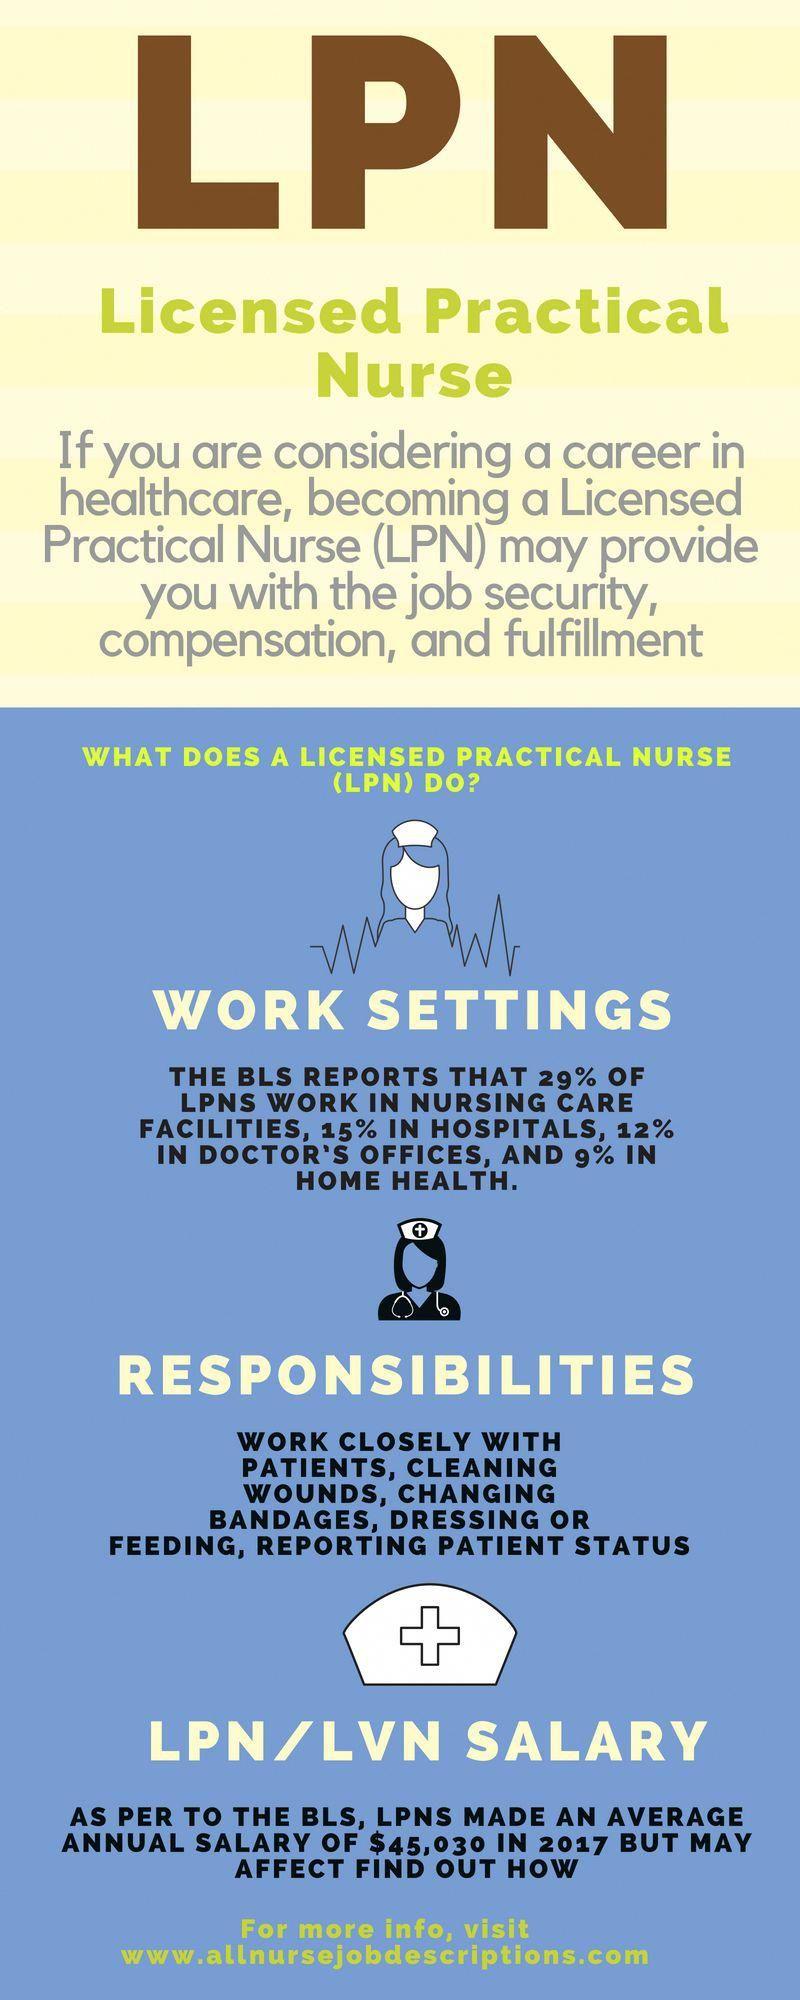 lpn programs in nj nursingschooltestbank Practical